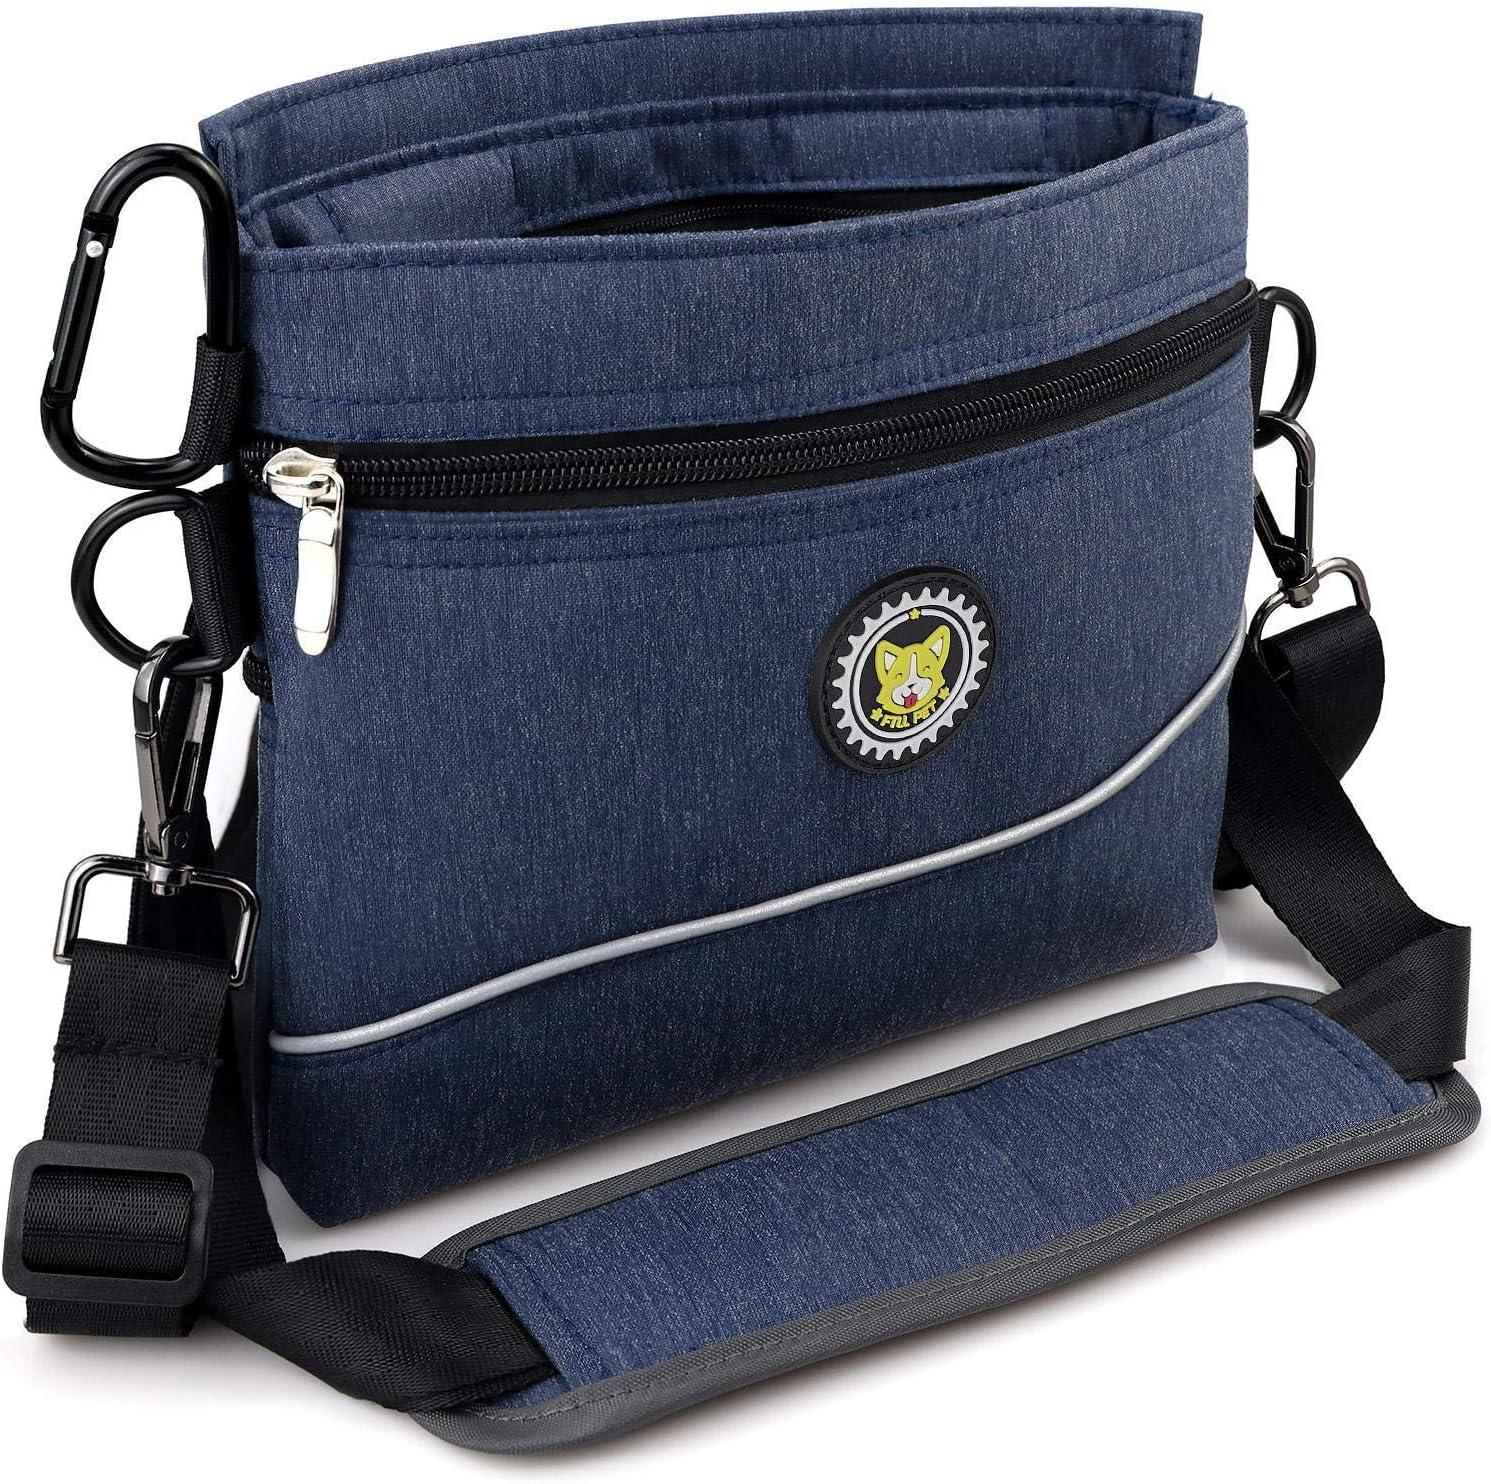 Viklluyr Dog Treat Pouch Bag with Magnetic Closure, Dog Food Carrier with Removable Inner Pocket, Built-in Poop Bag Dispenser Perfect Dog Training Bag for Agility Training - Including Carabiner